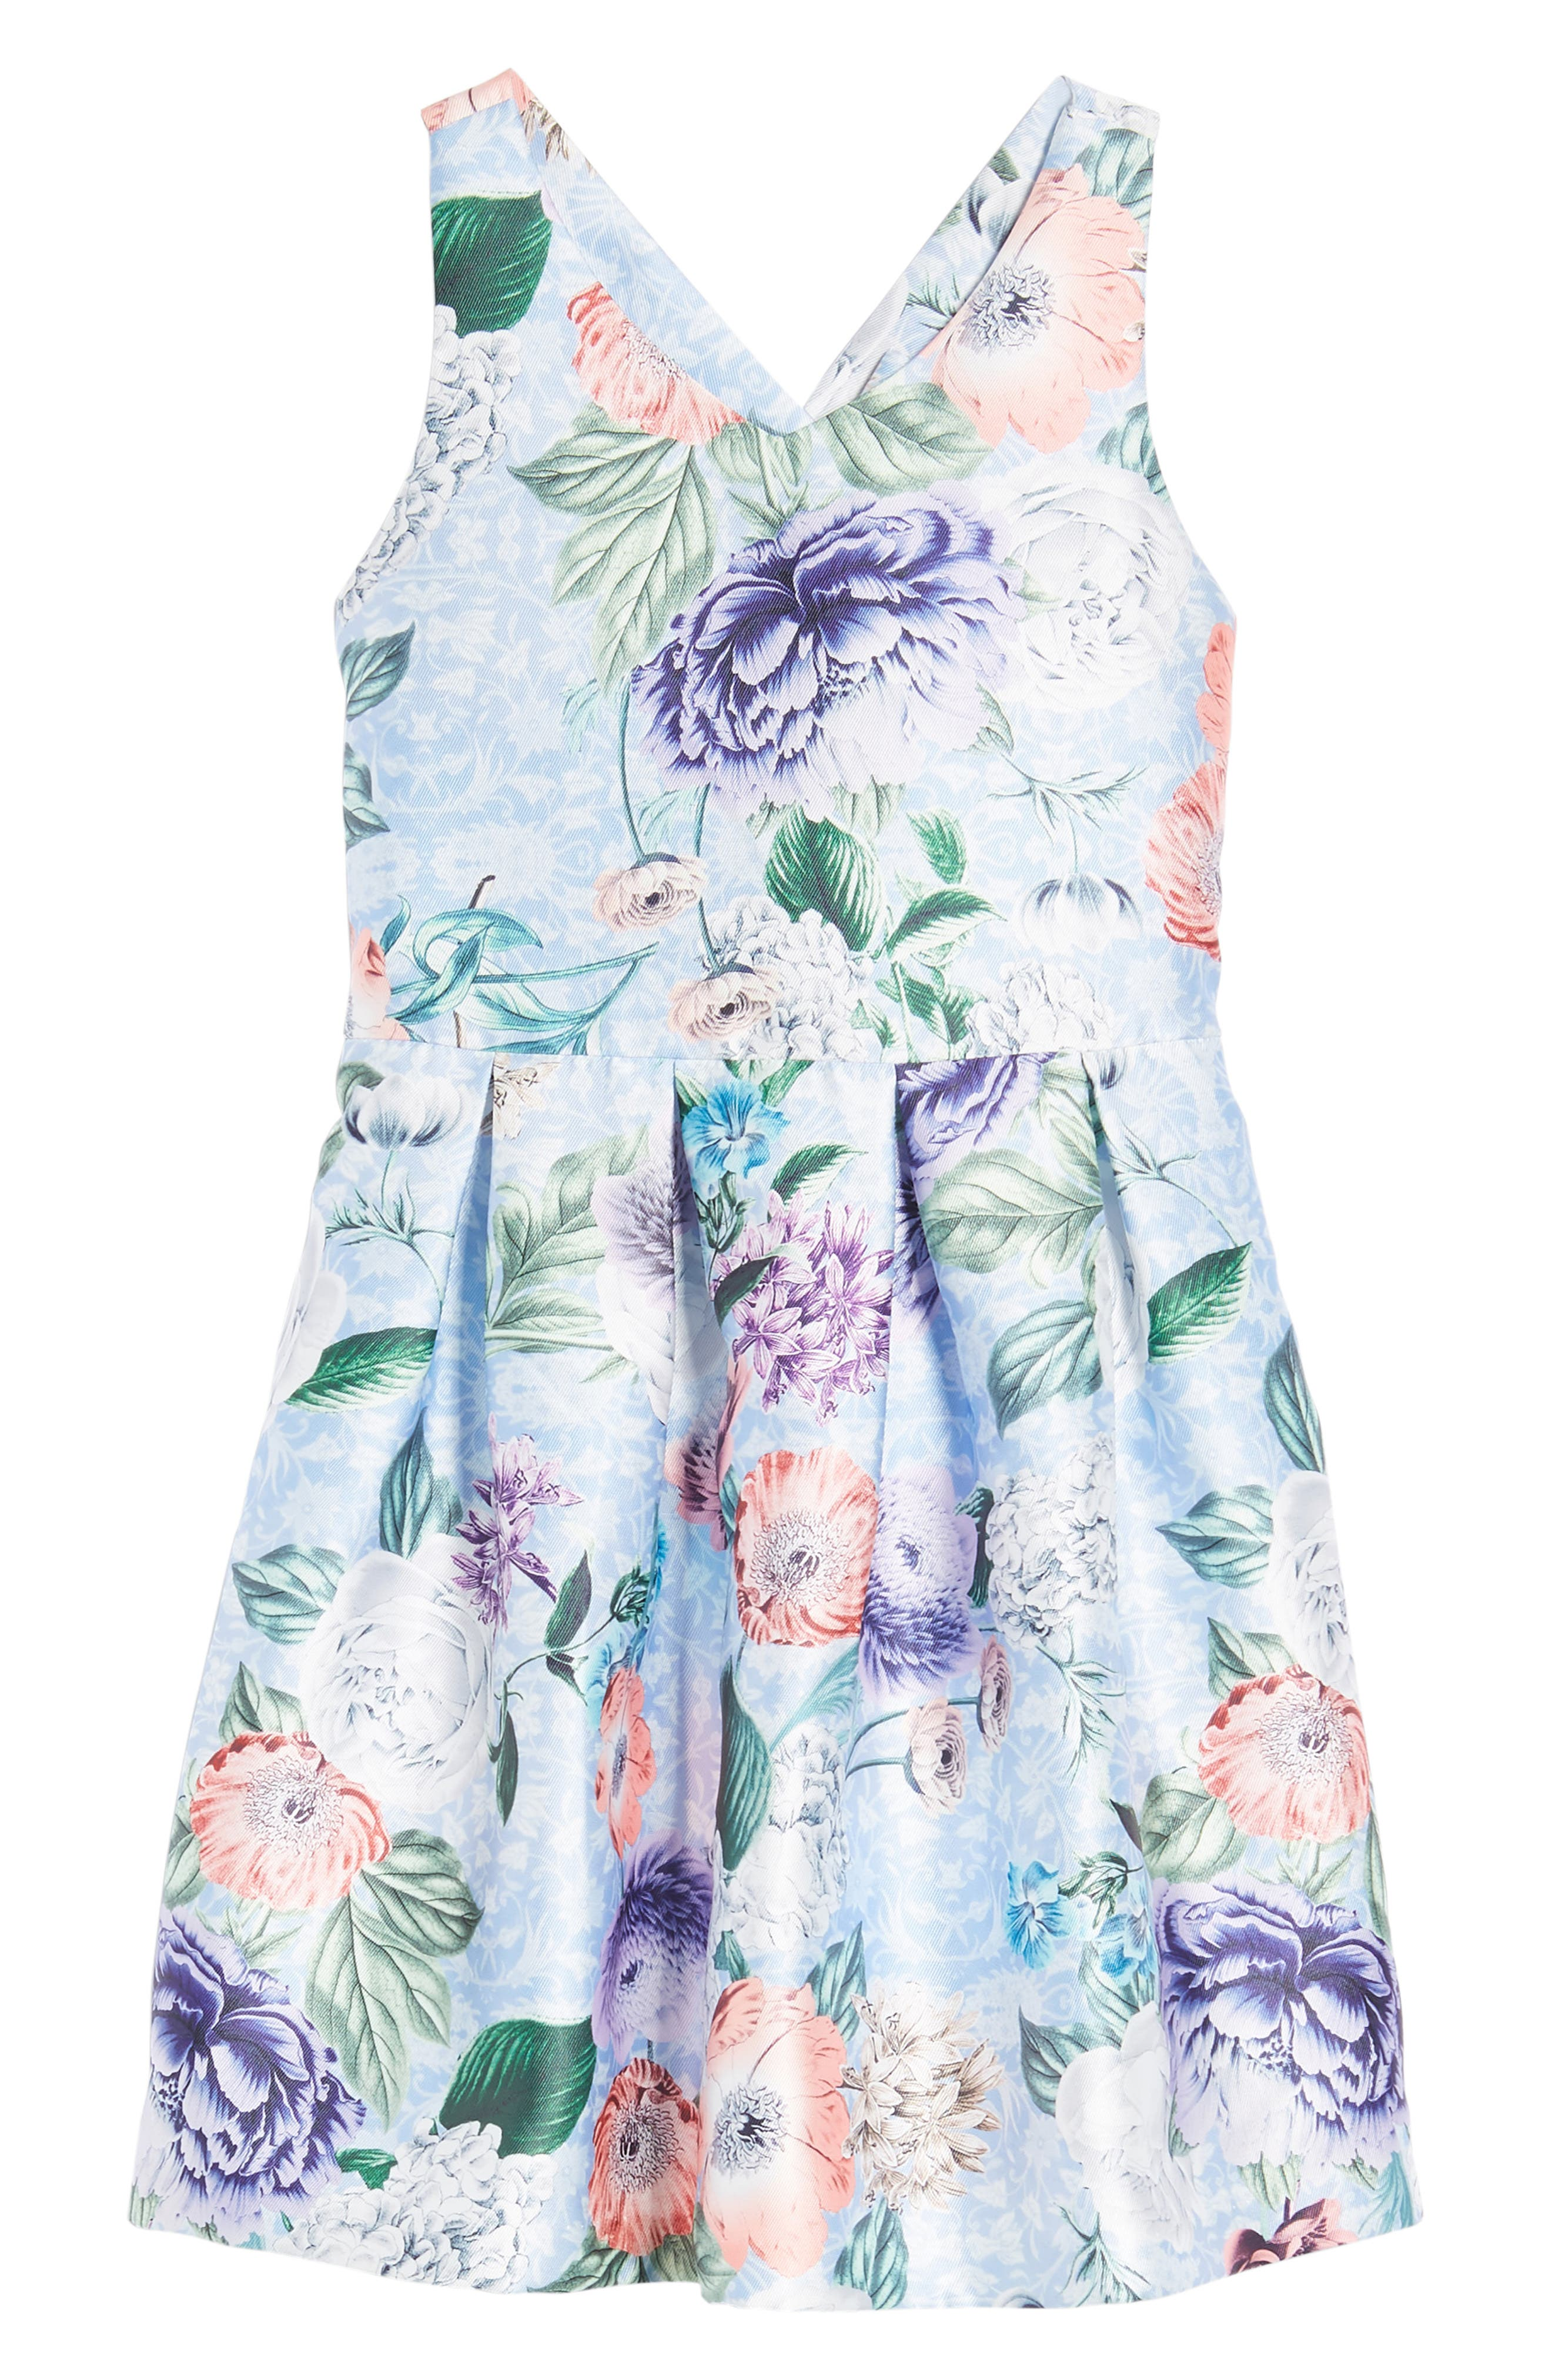 Floral Cross Back Dress,                             Main thumbnail 1, color,                             400